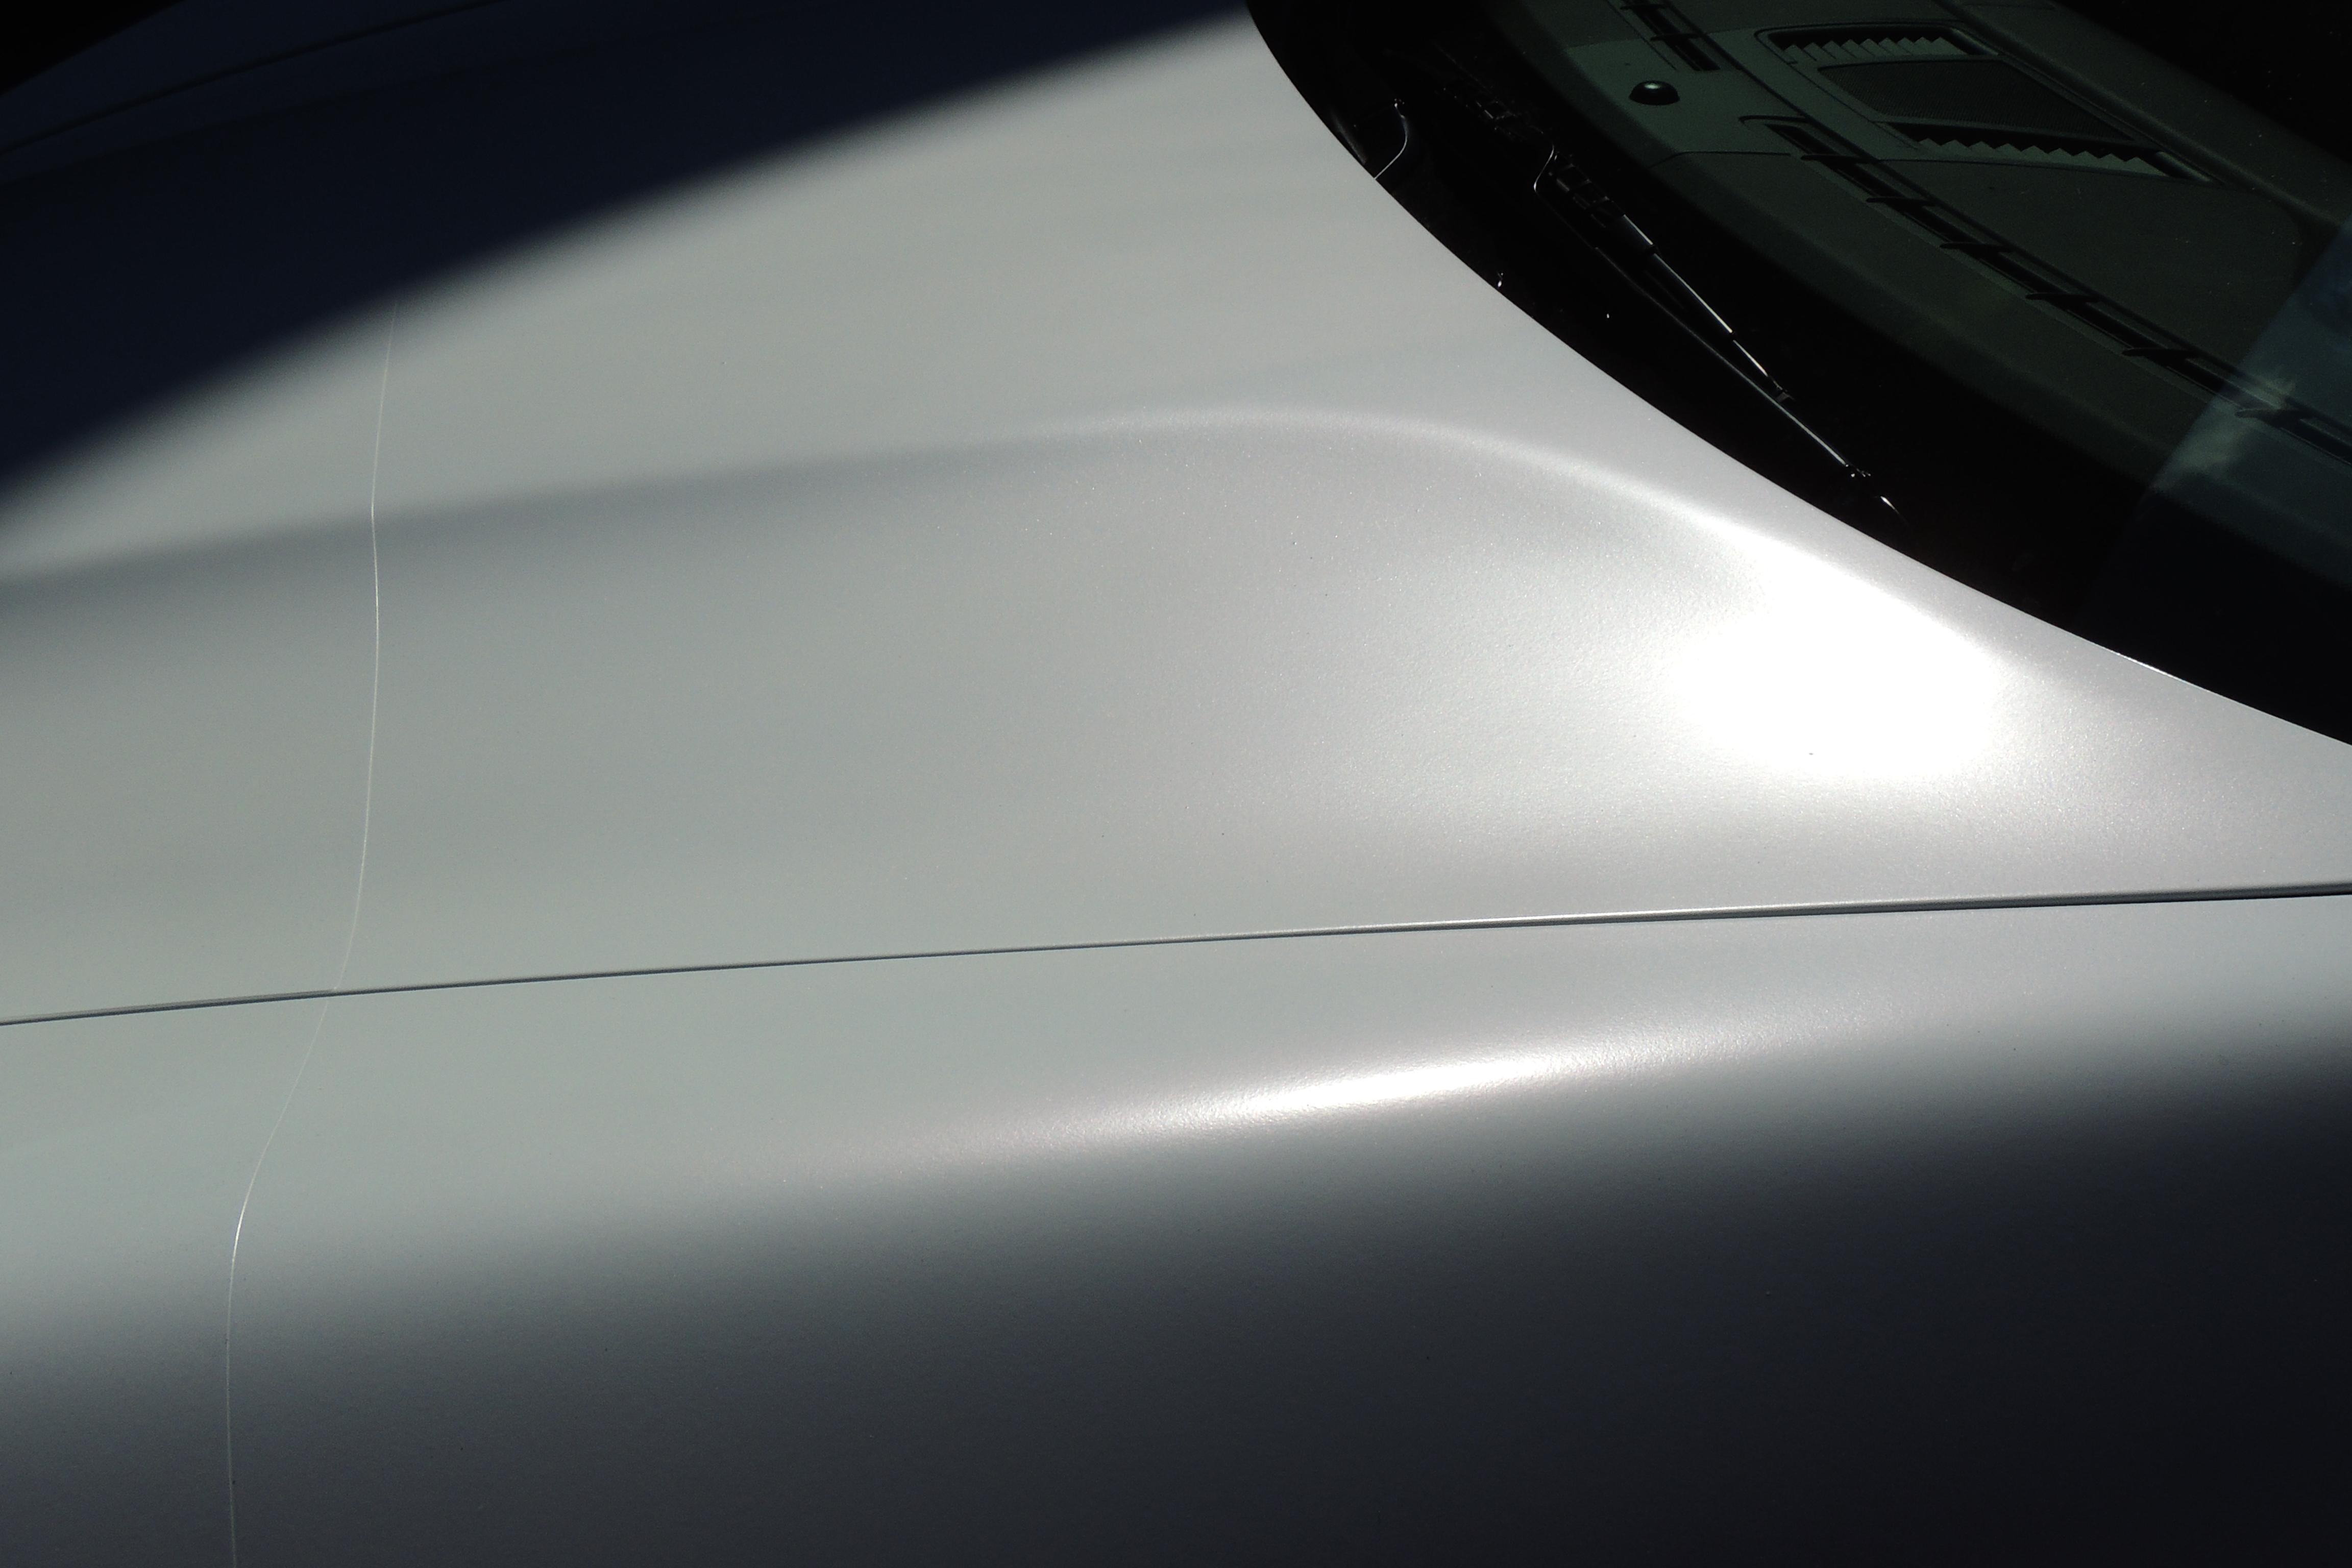 2014 Porsche Panamera S Hybrid